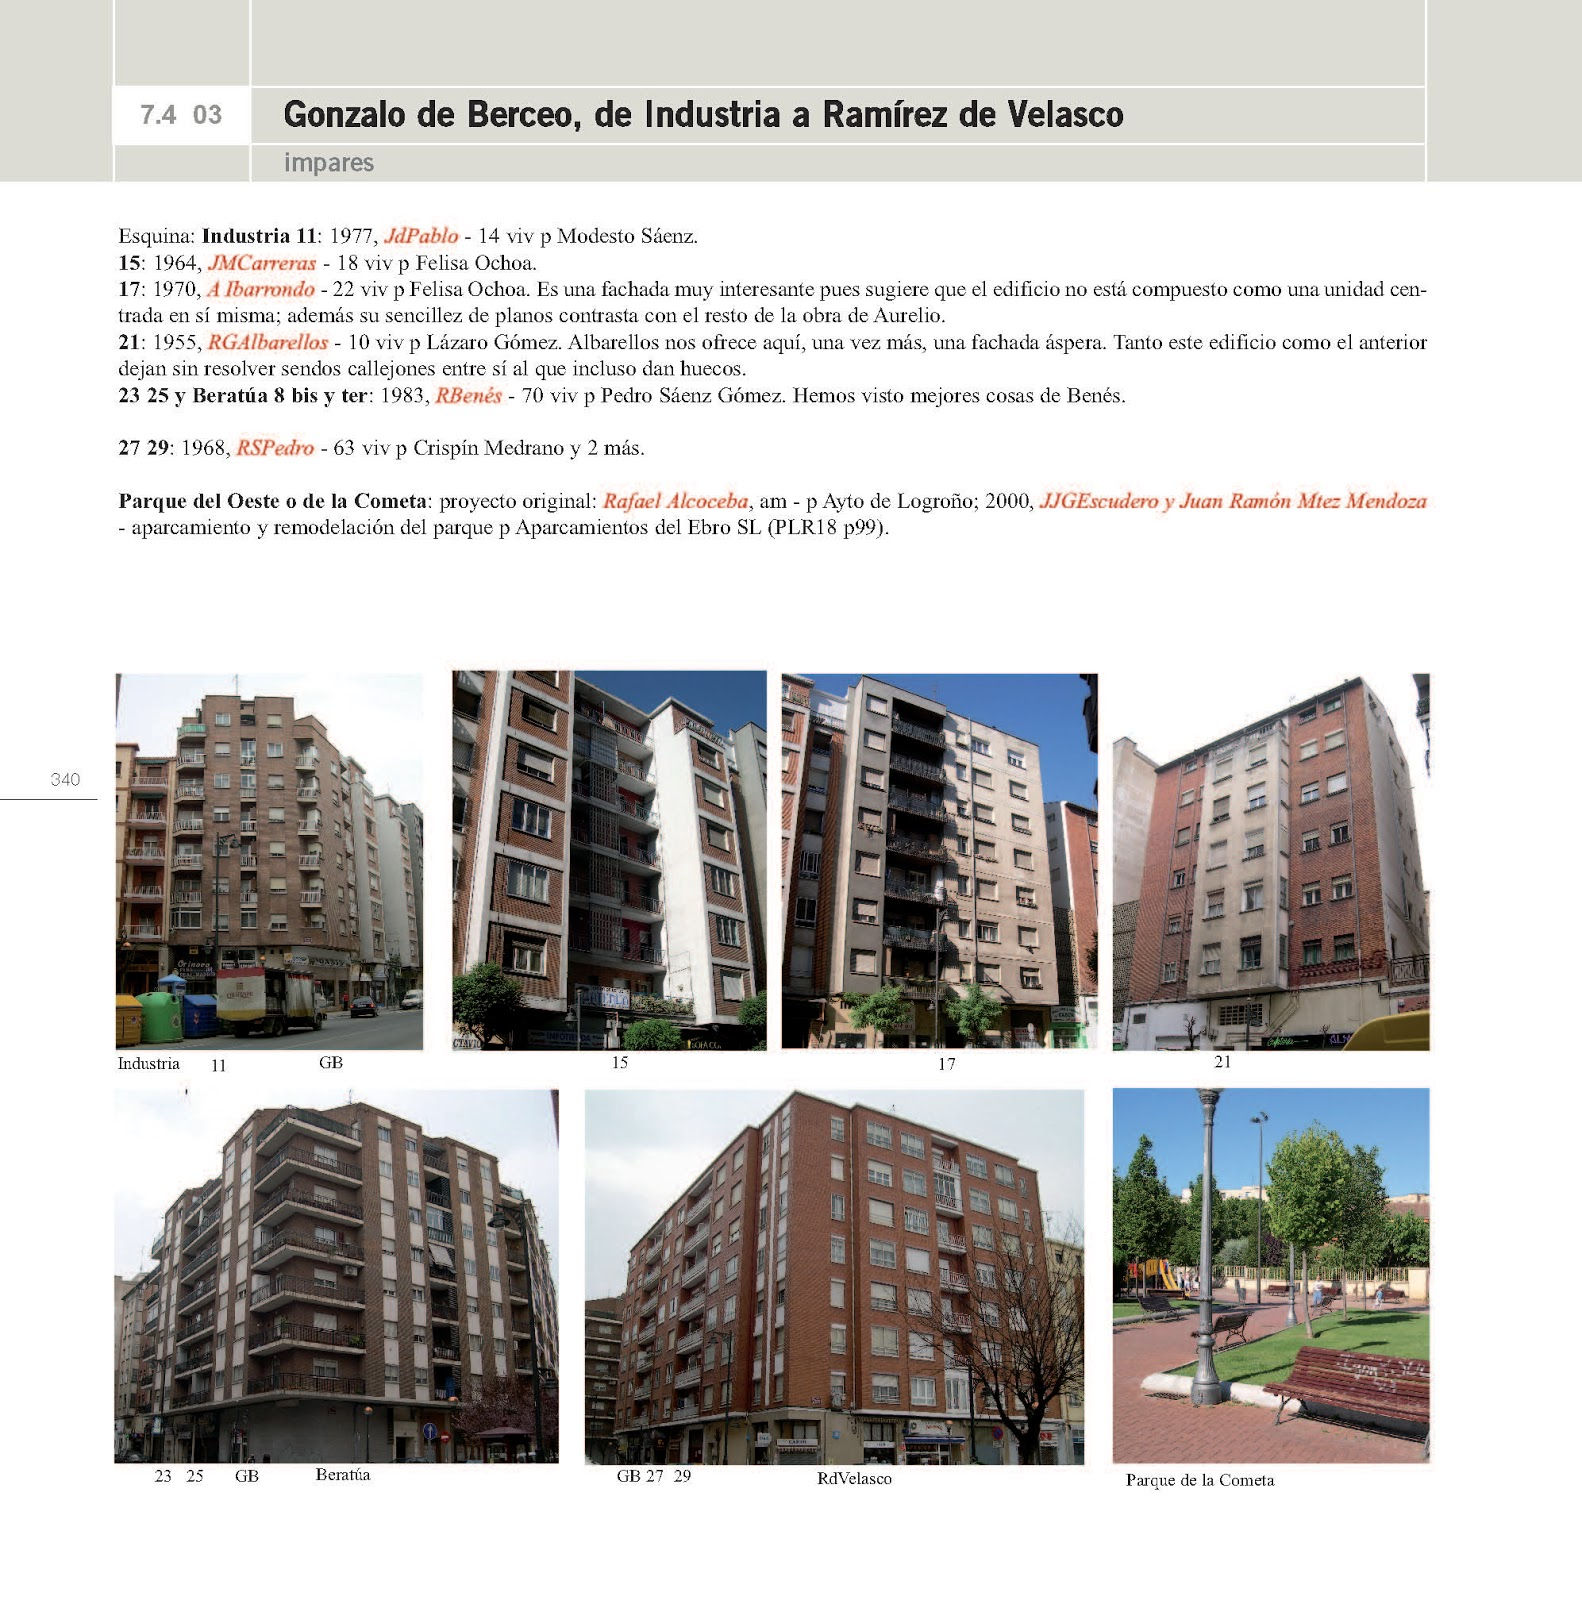 Guia de arquitectura de logro o paginas 7 4 03 gonzalo for Paginas arquitectura